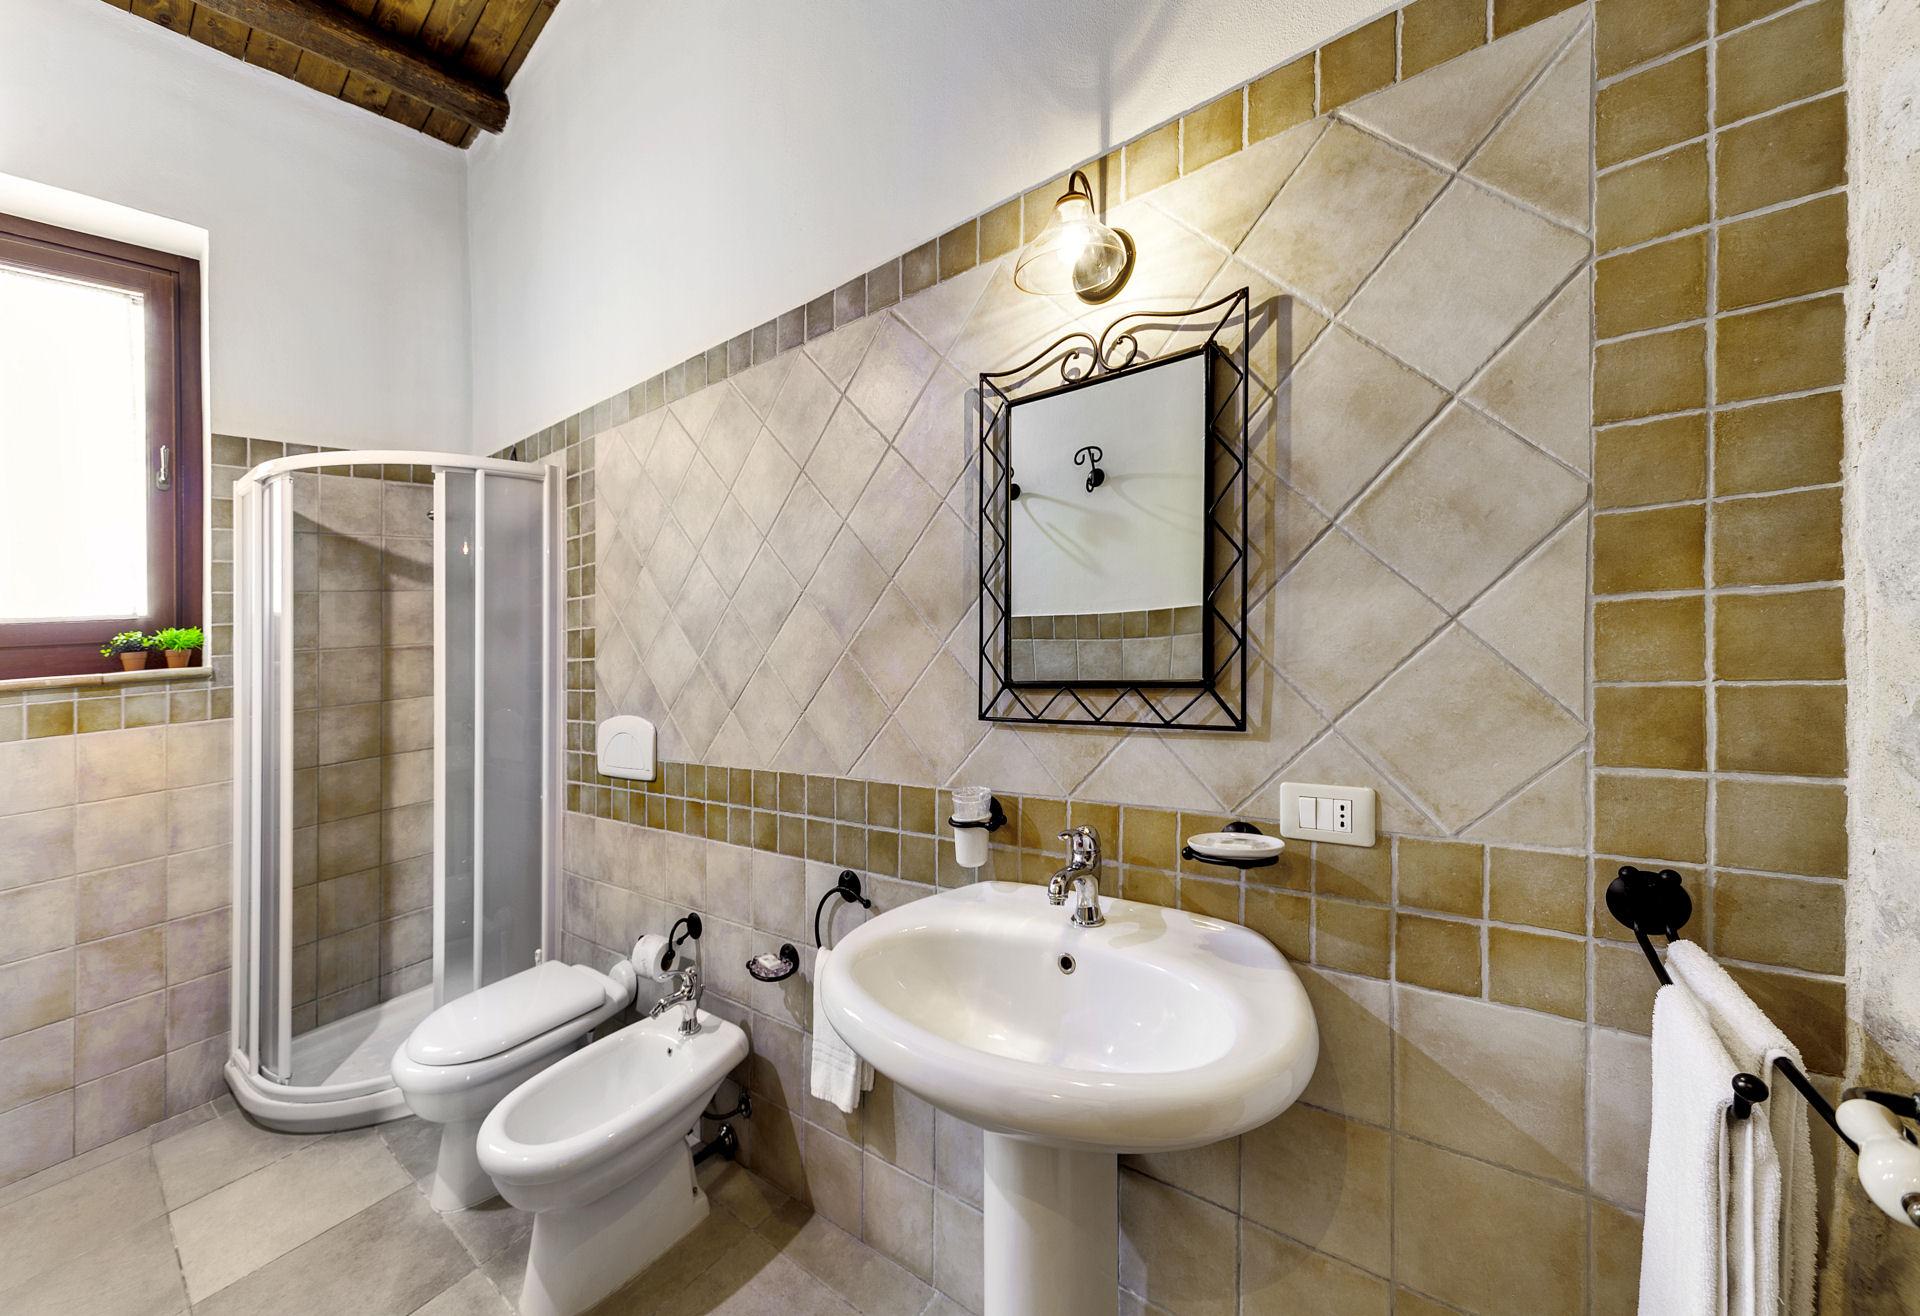 BILOCALE SILVA SURI, Silva Suri, Country Hotel, Ragusa, Marina di Ragusa, Sala Ricevimenti. Hotel